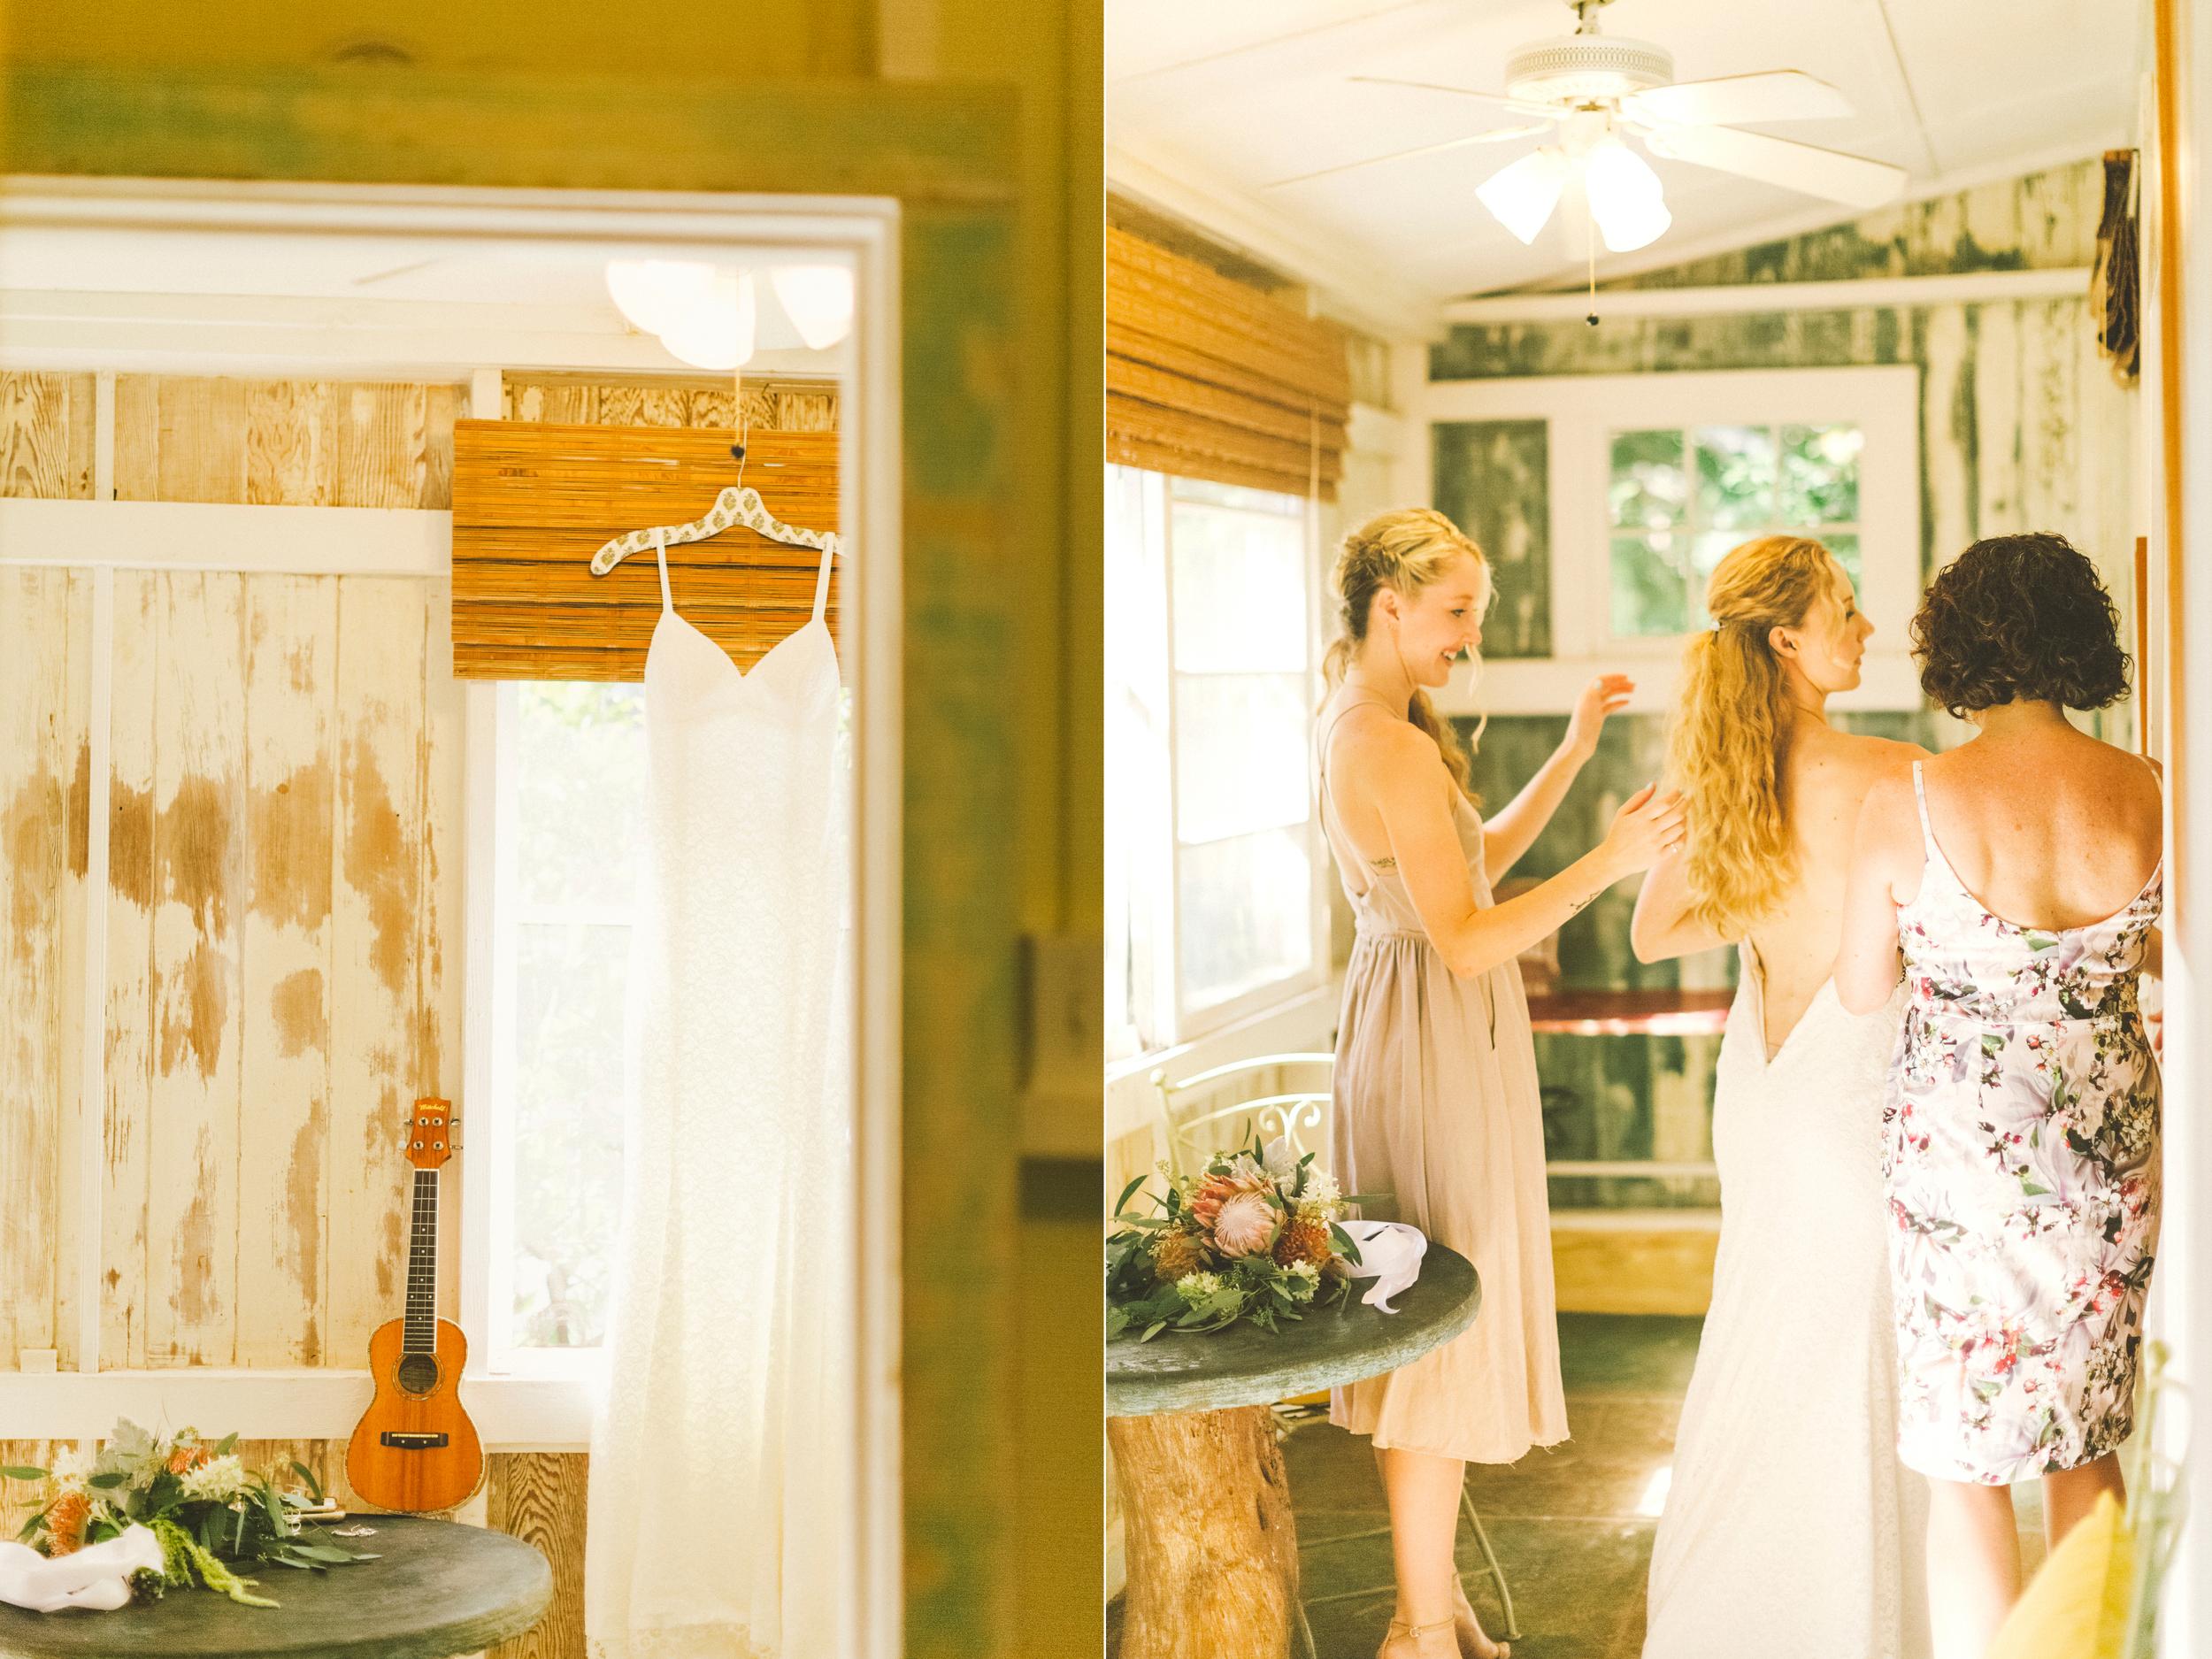 angie-diaz-photography-maui-wedding-26.jpg